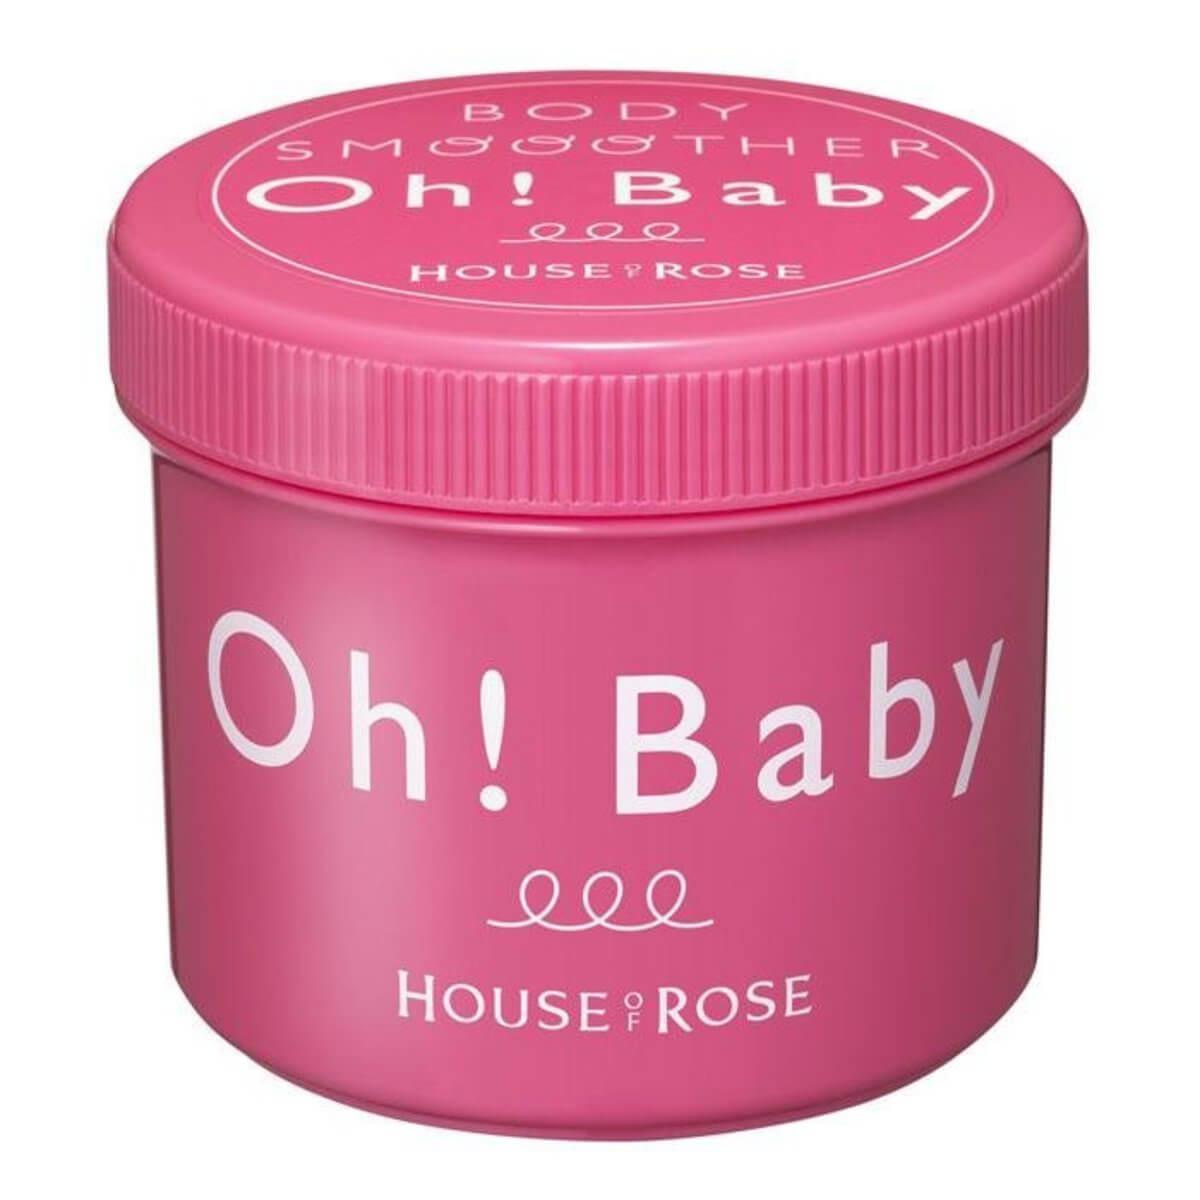 HOUSE OF ROSE Oh! Baby 身體去角質磨砂膏 HK$198/570g 主要成分為溫泉水的結晶,添加了蠶絲微粒,因此砂粒非常細膩,不會傷害嬌嫩肌膚,有助去除肌膚死皮、老化角質。產品加入美白成分,磨砂的同時讓肌膚淨白清爽,提升亮度。